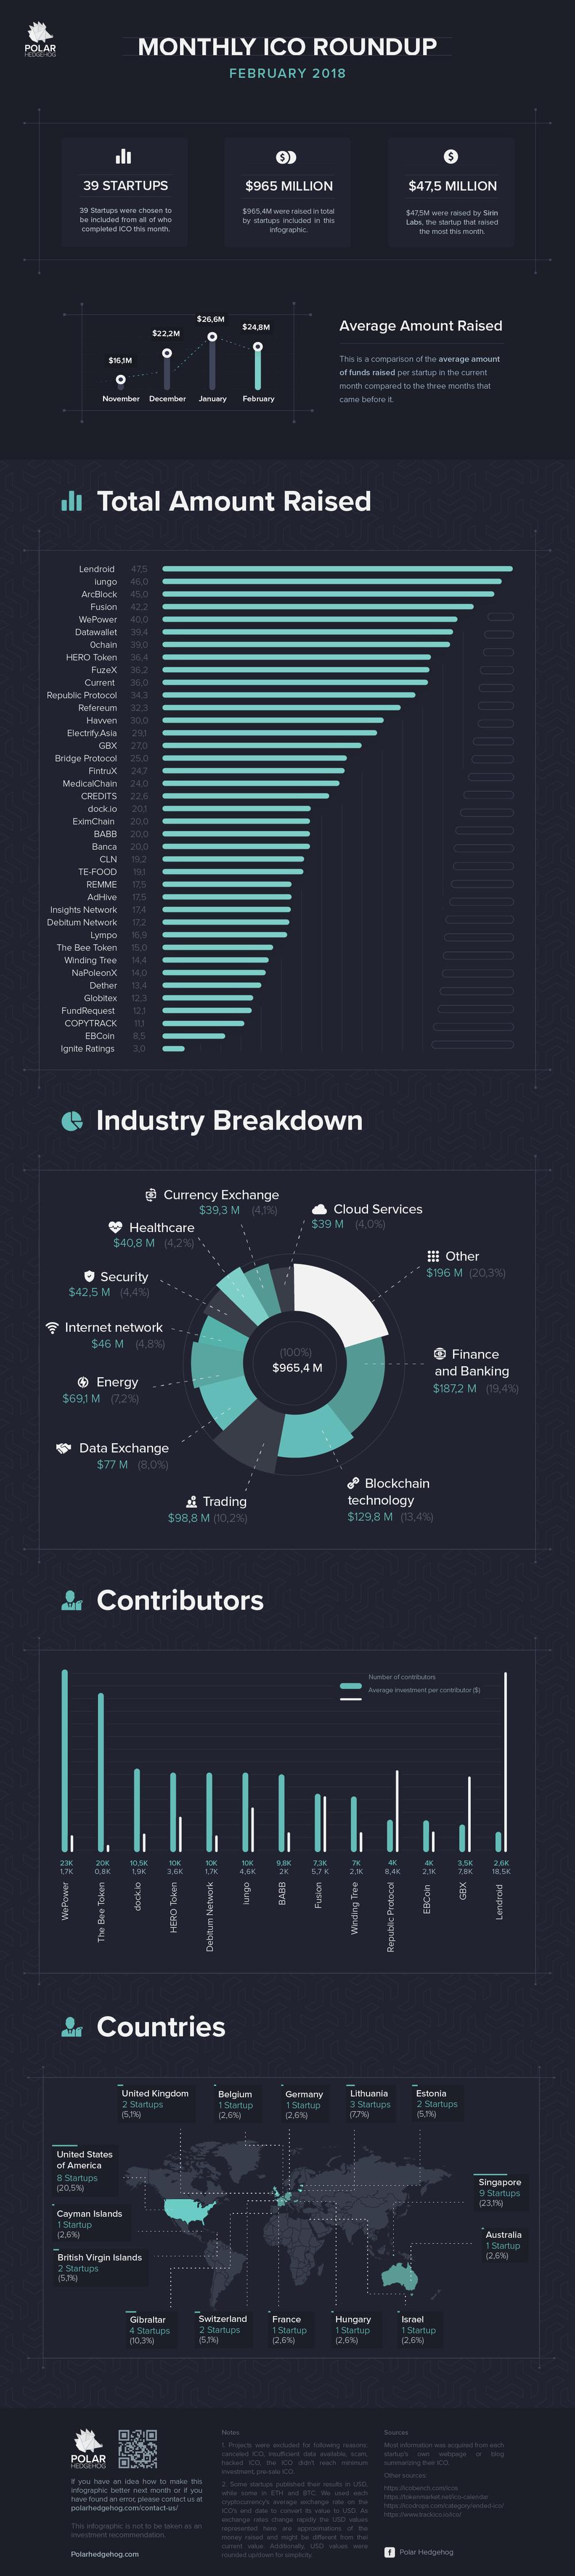 Polar Hedgehog - ICO Roundup Infographic - February 2018